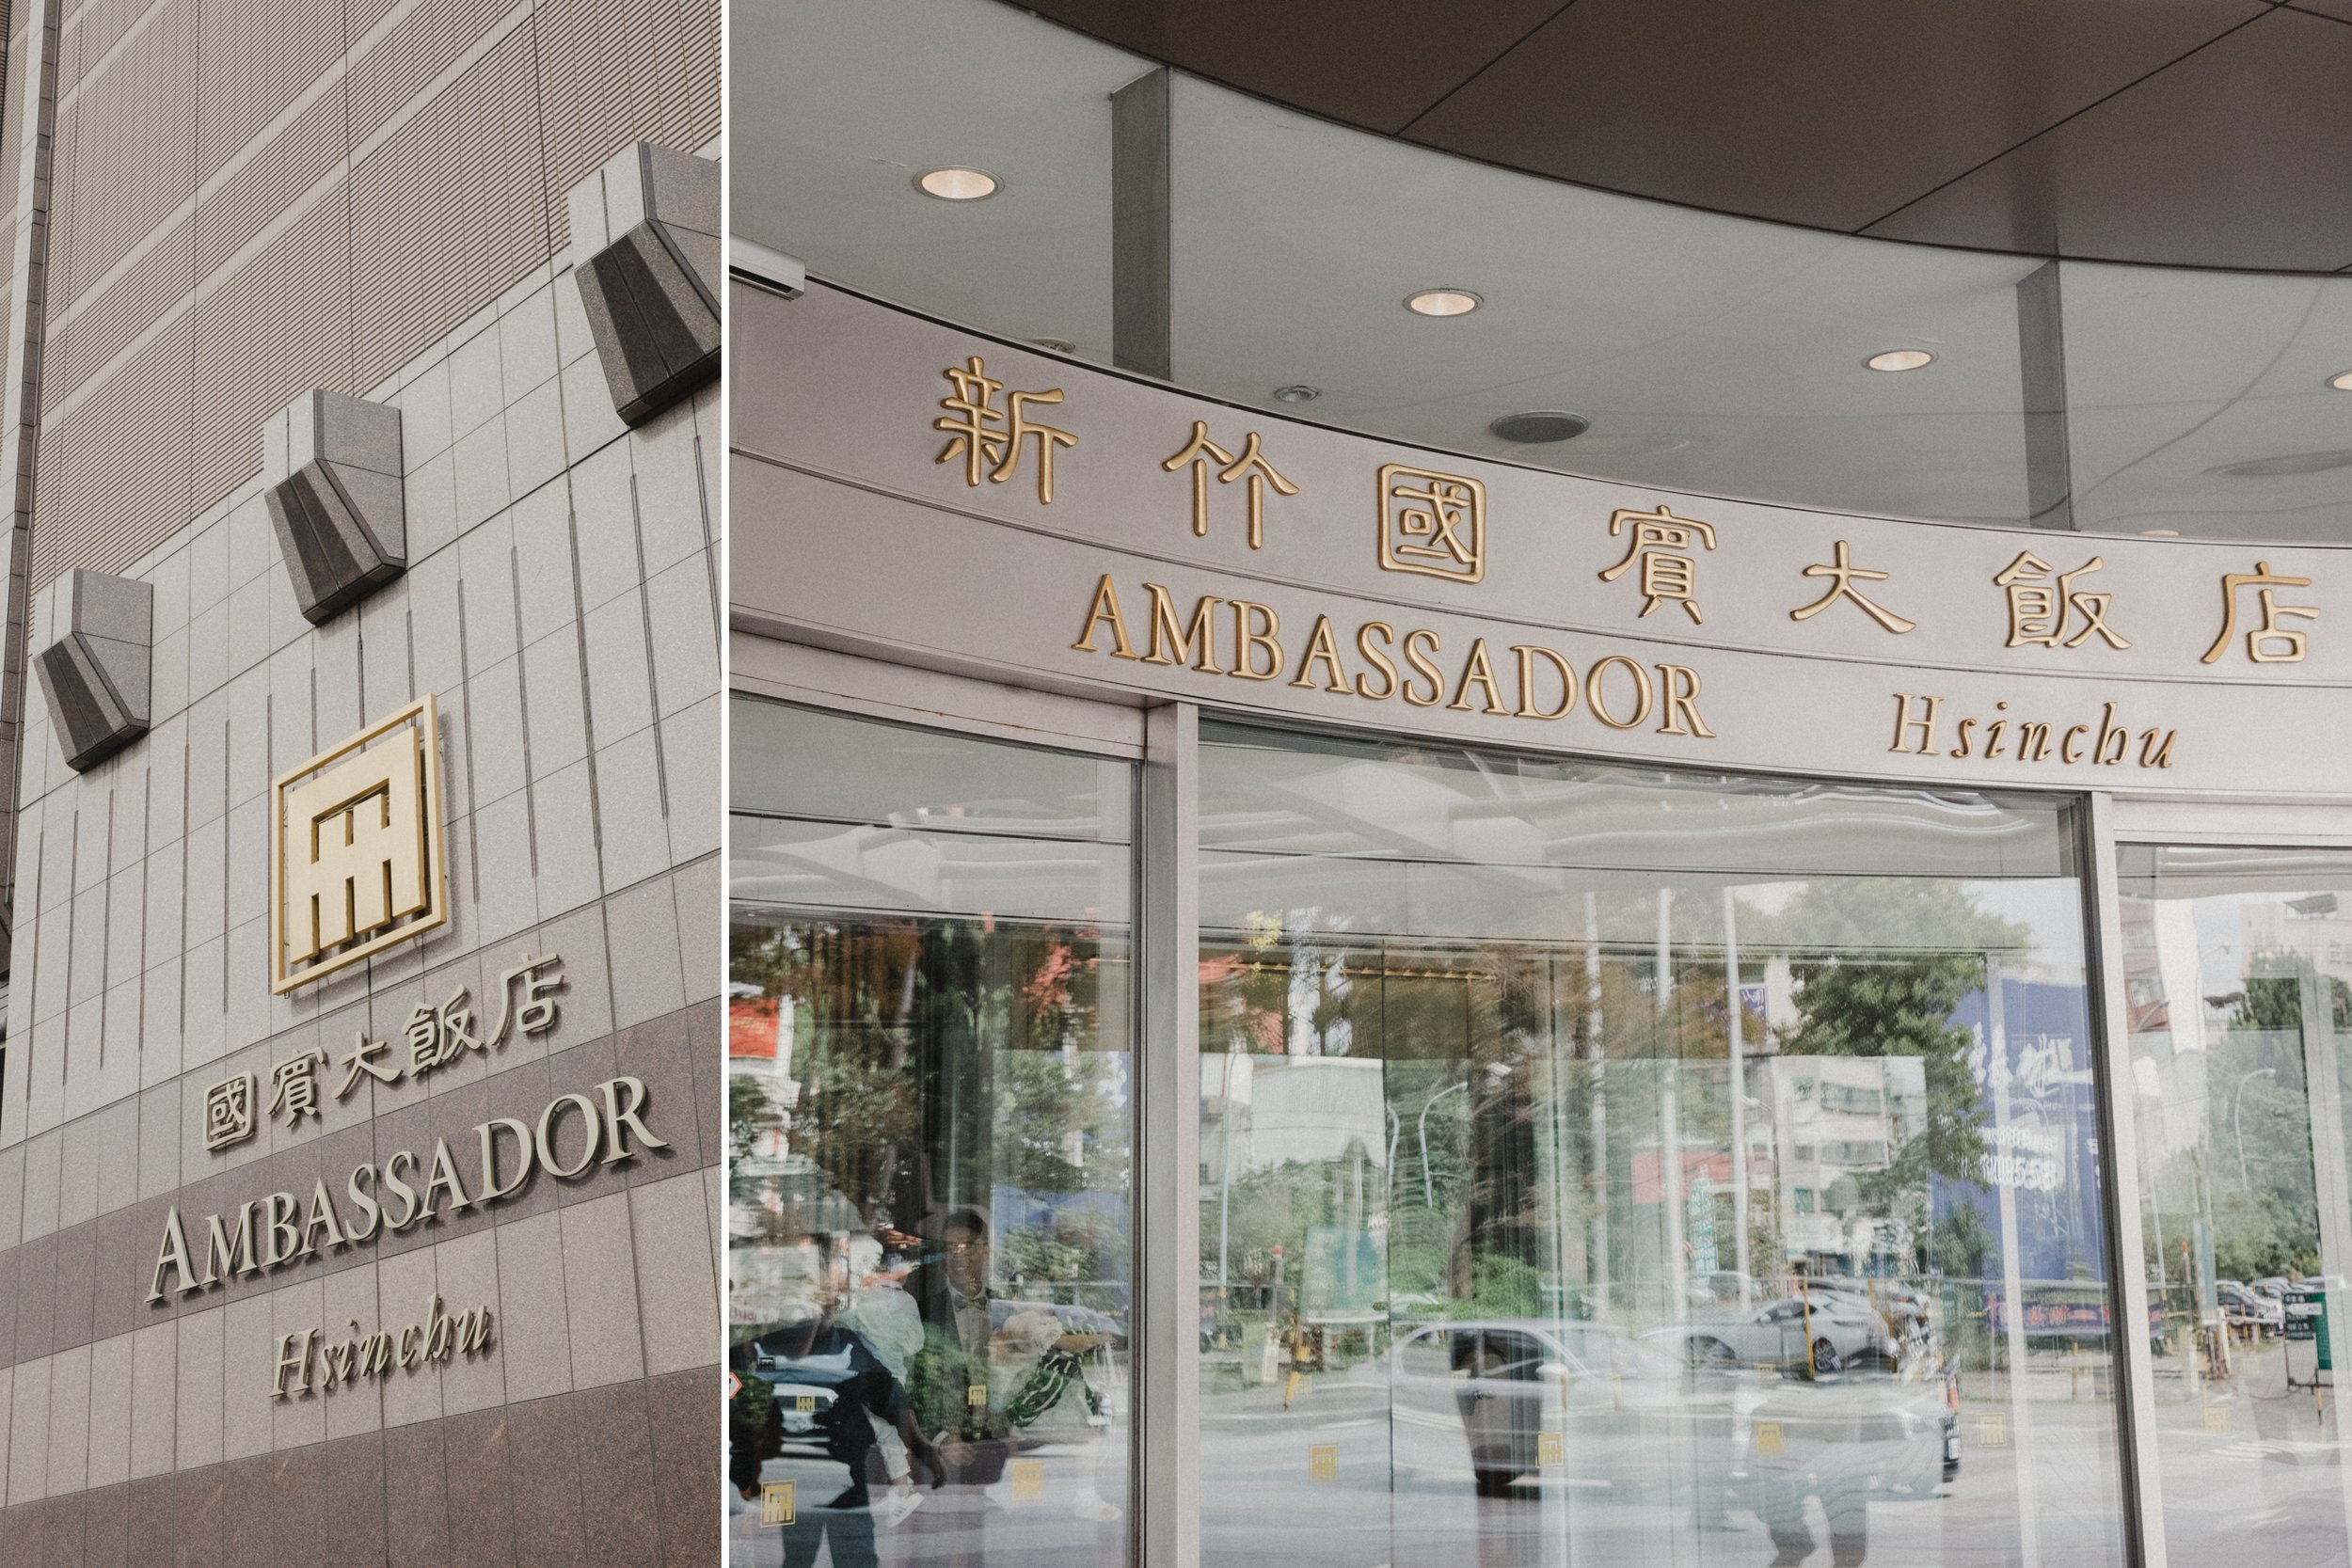 wedding-caridee-oscar-lunch-ambassador-hsinchu-結婚午宴-新竹國賓_02.jpg